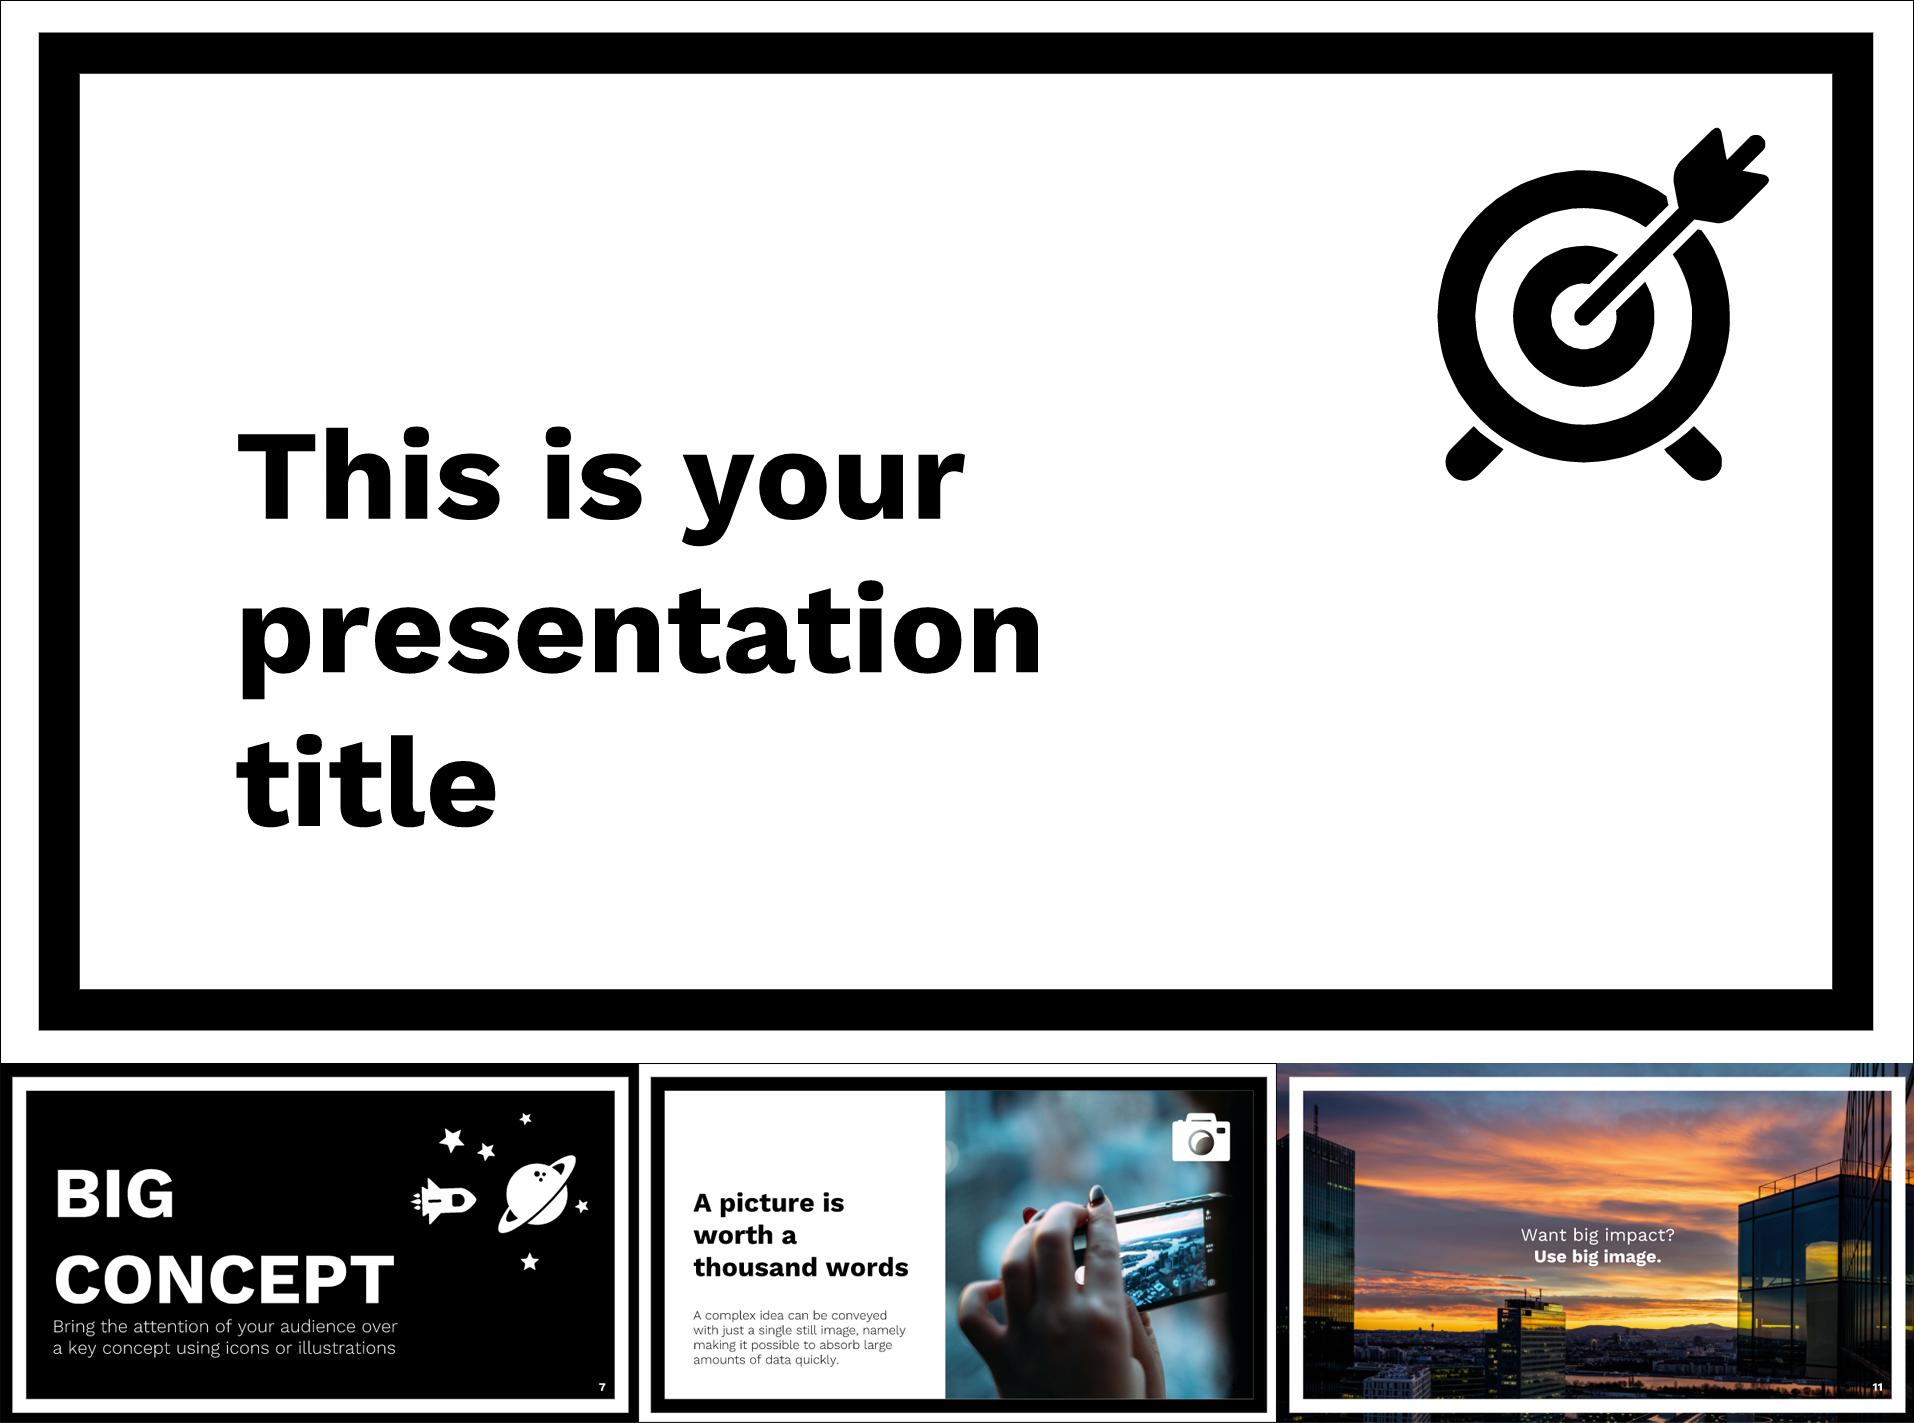 Black & White Free Google Slides Templates Theme - The Internet Tips